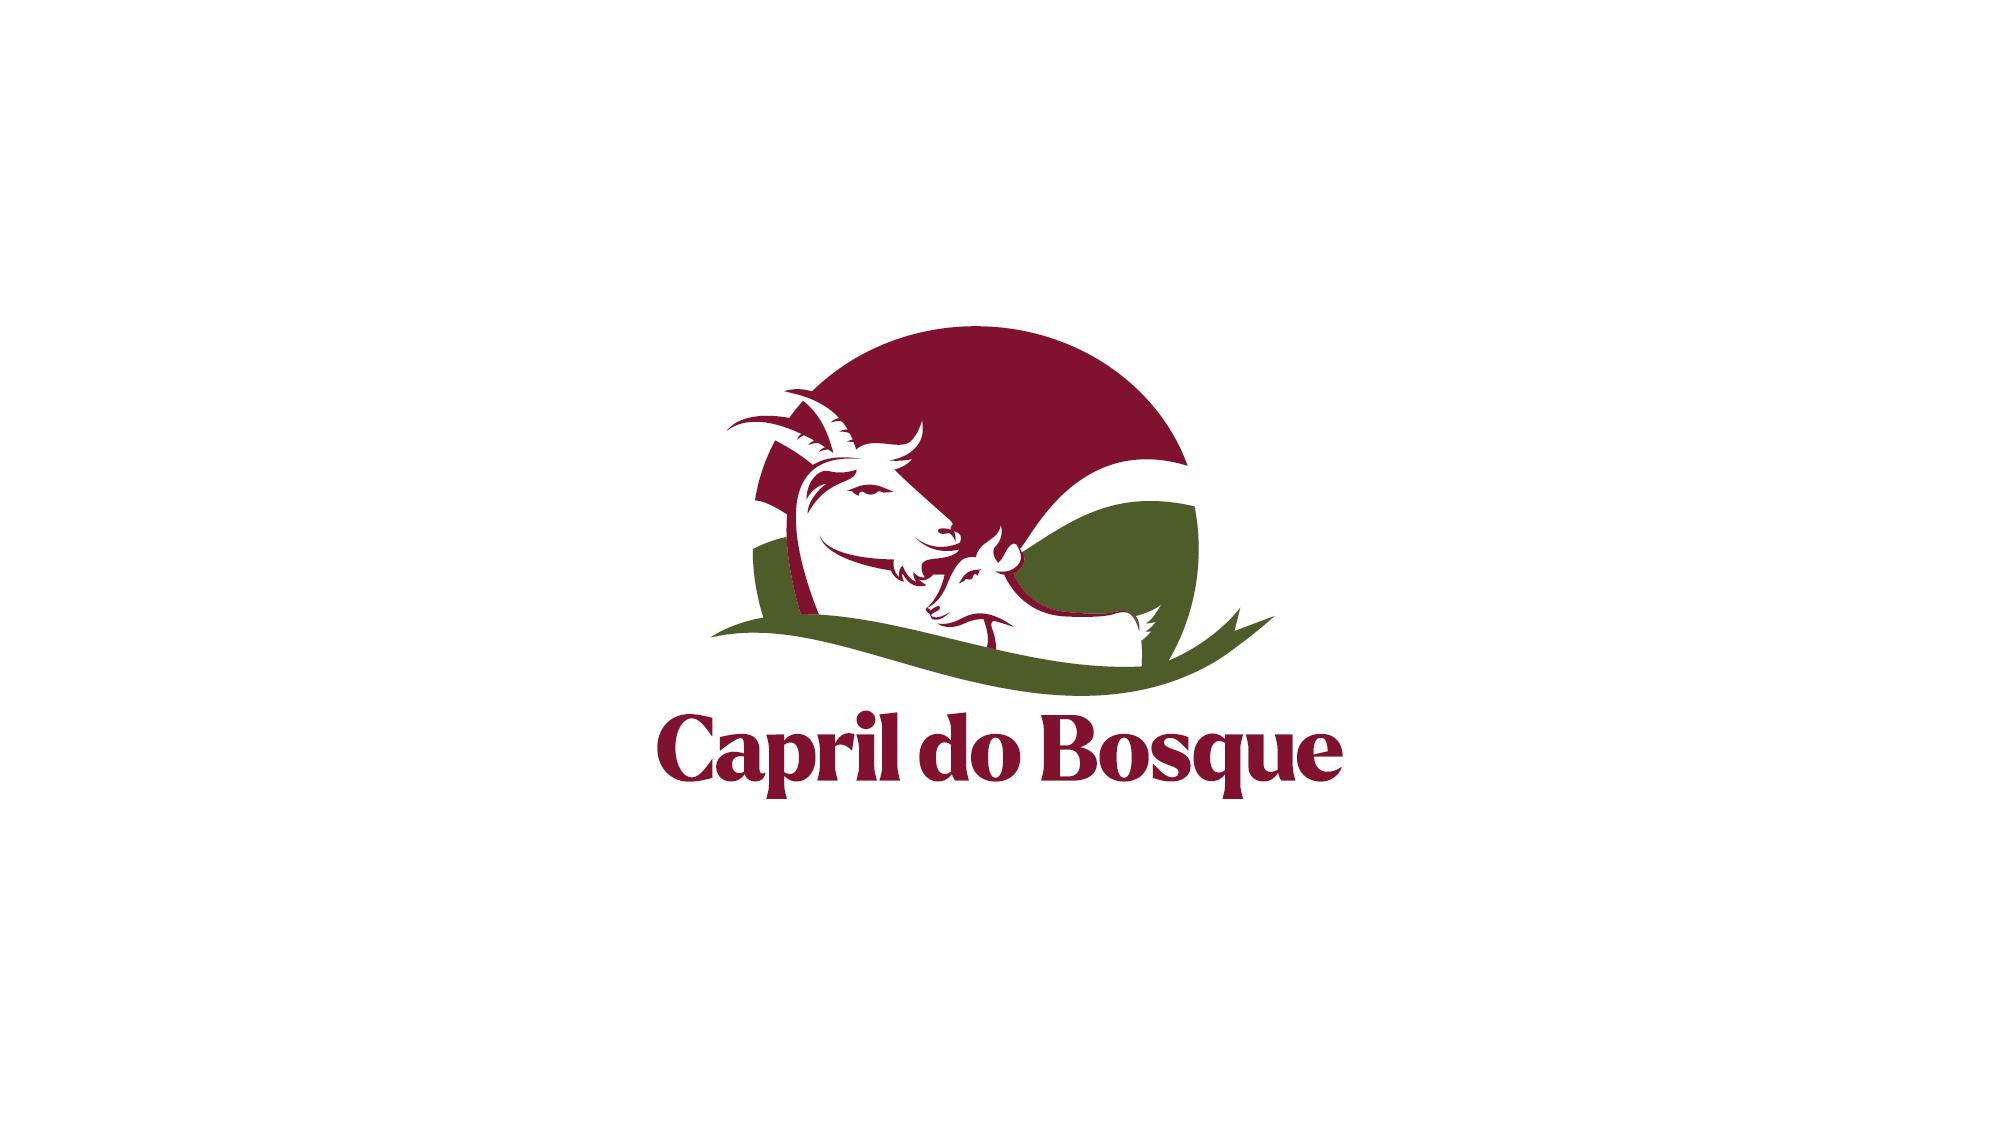 Lanatta-Branding-Capril-do-Bosque5